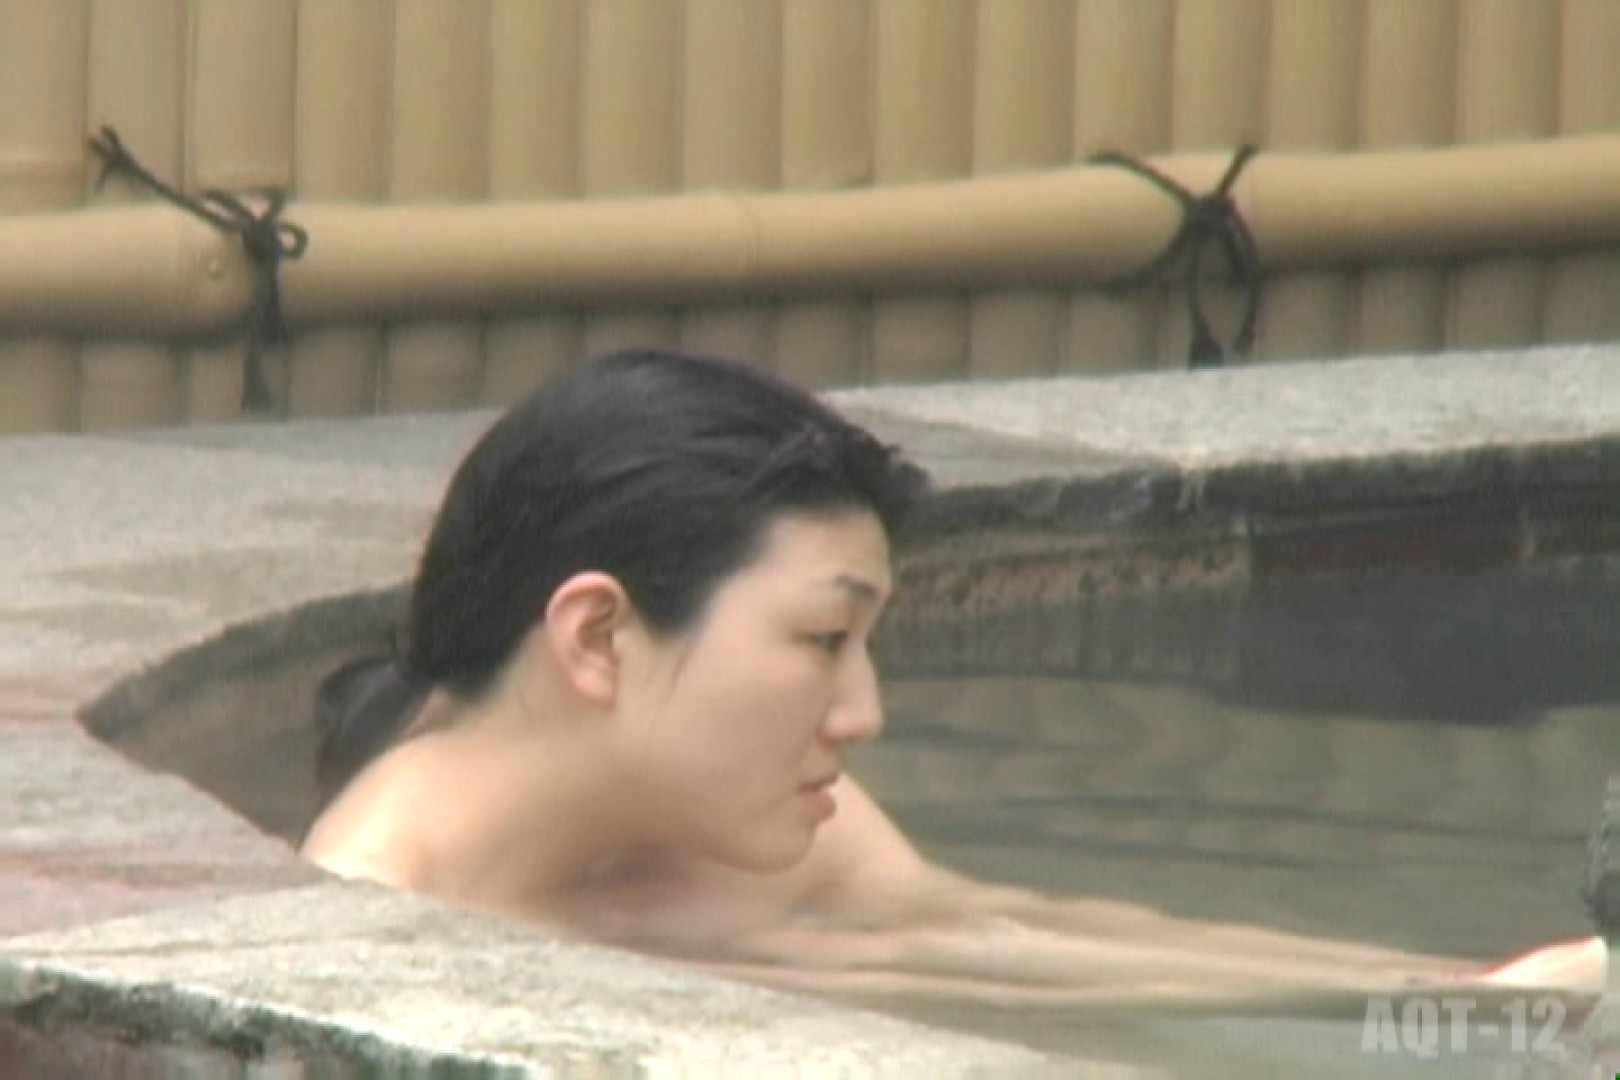 Aquaな露天風呂Vol.810 露天風呂編  108PIX 52